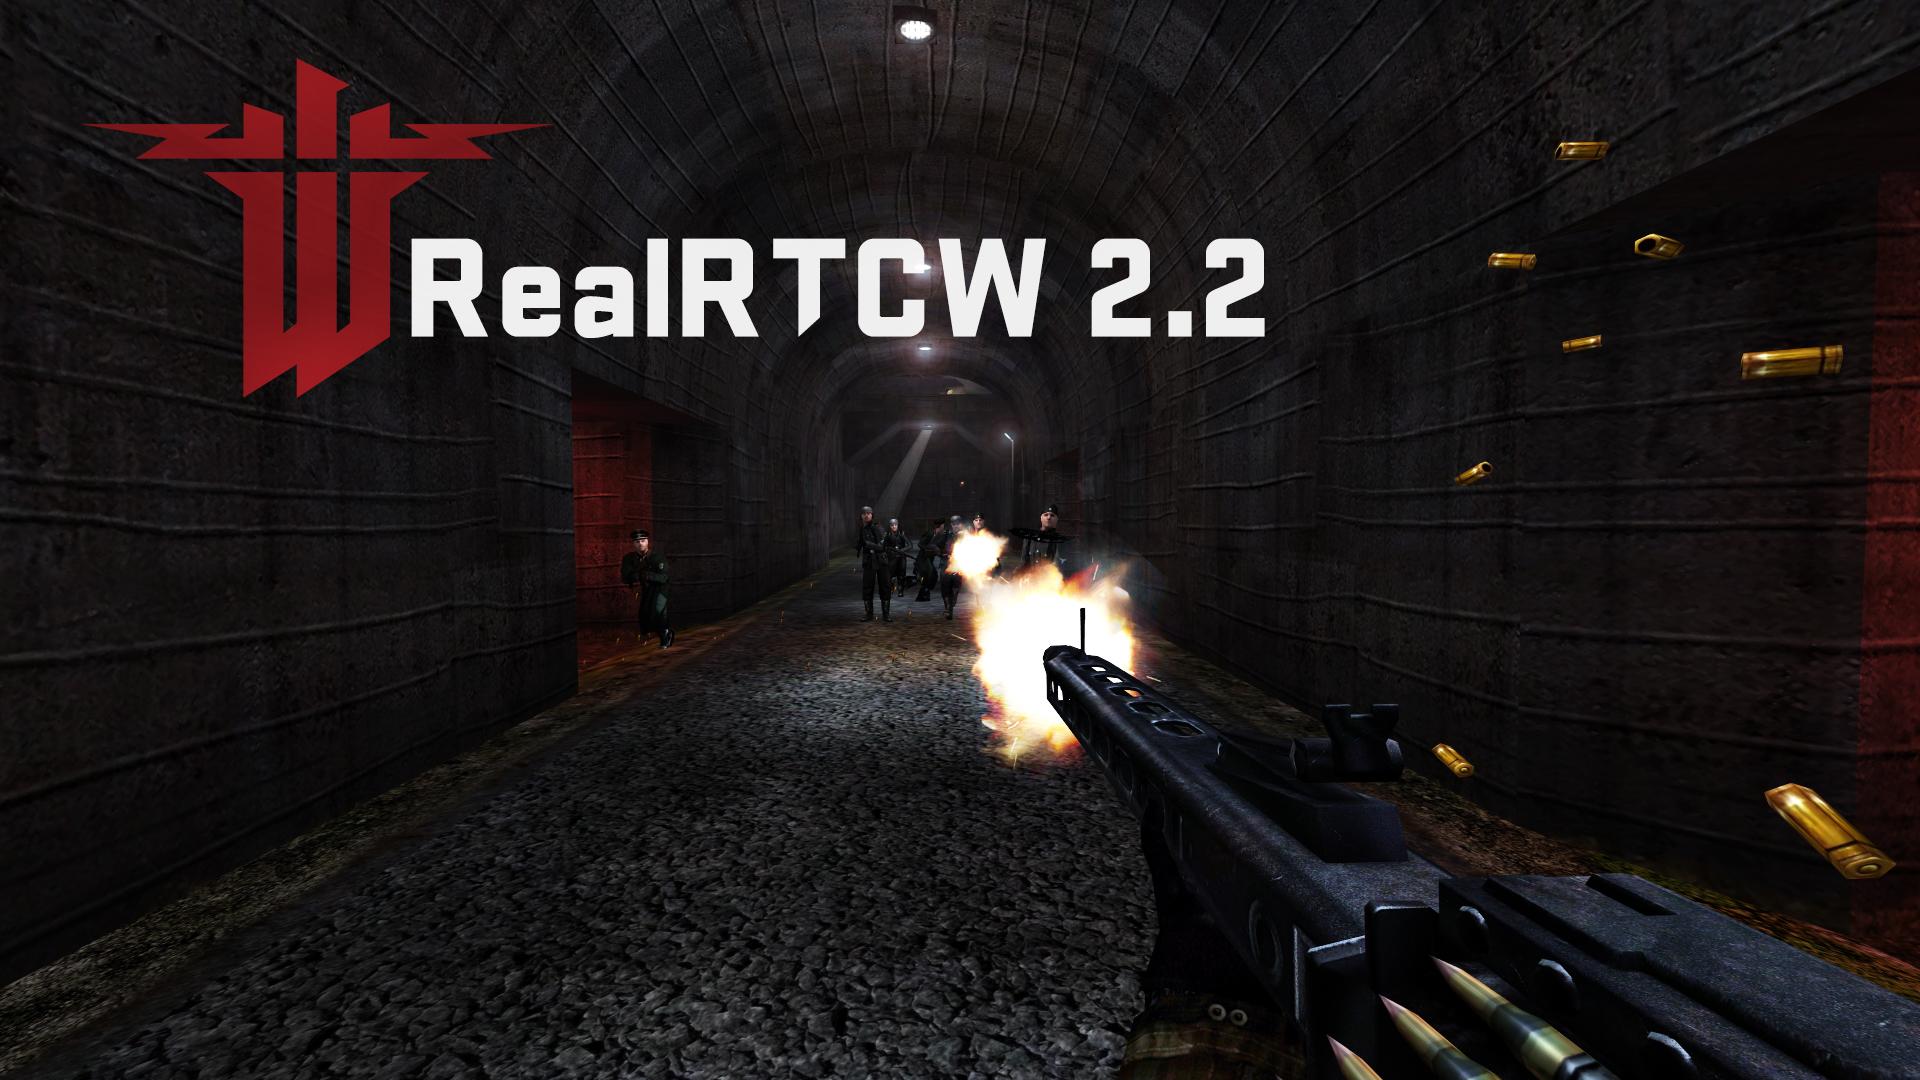 RealRTCW 2 2 - Released! news - Mod DB